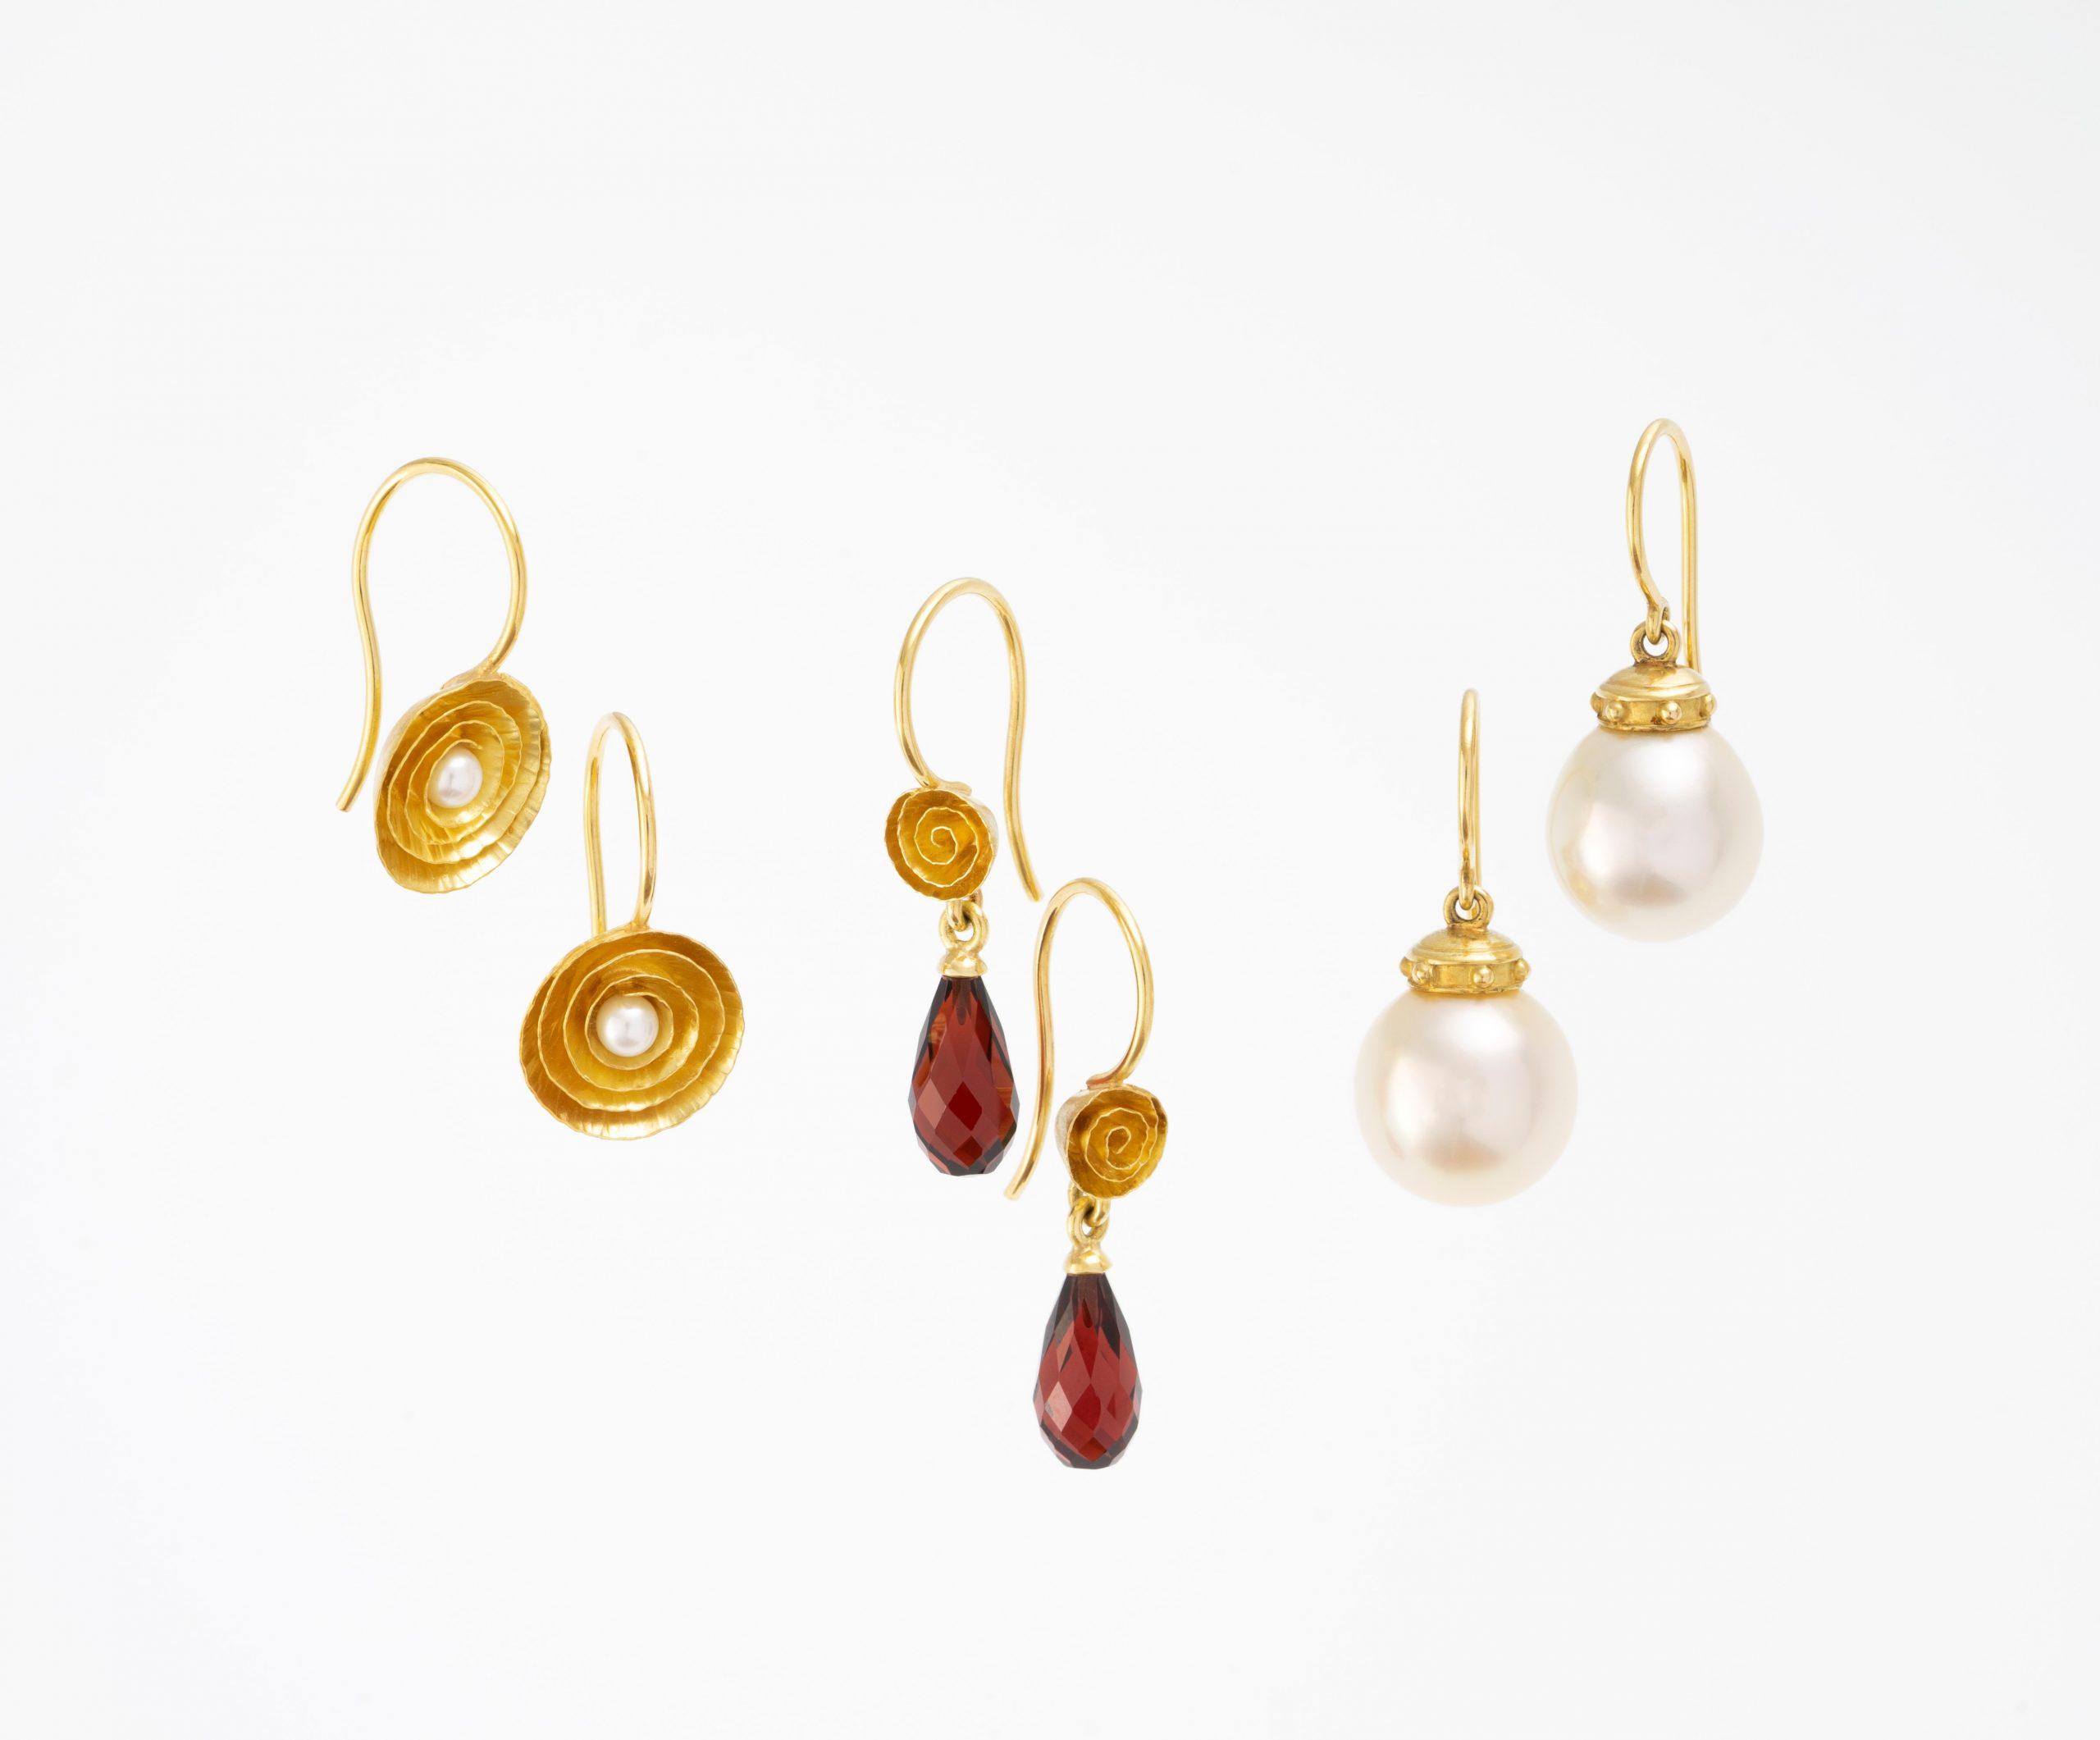 Ohrringe-Ohrschmuck-gelbgold-Goldschmiede-Christiane-Oexl